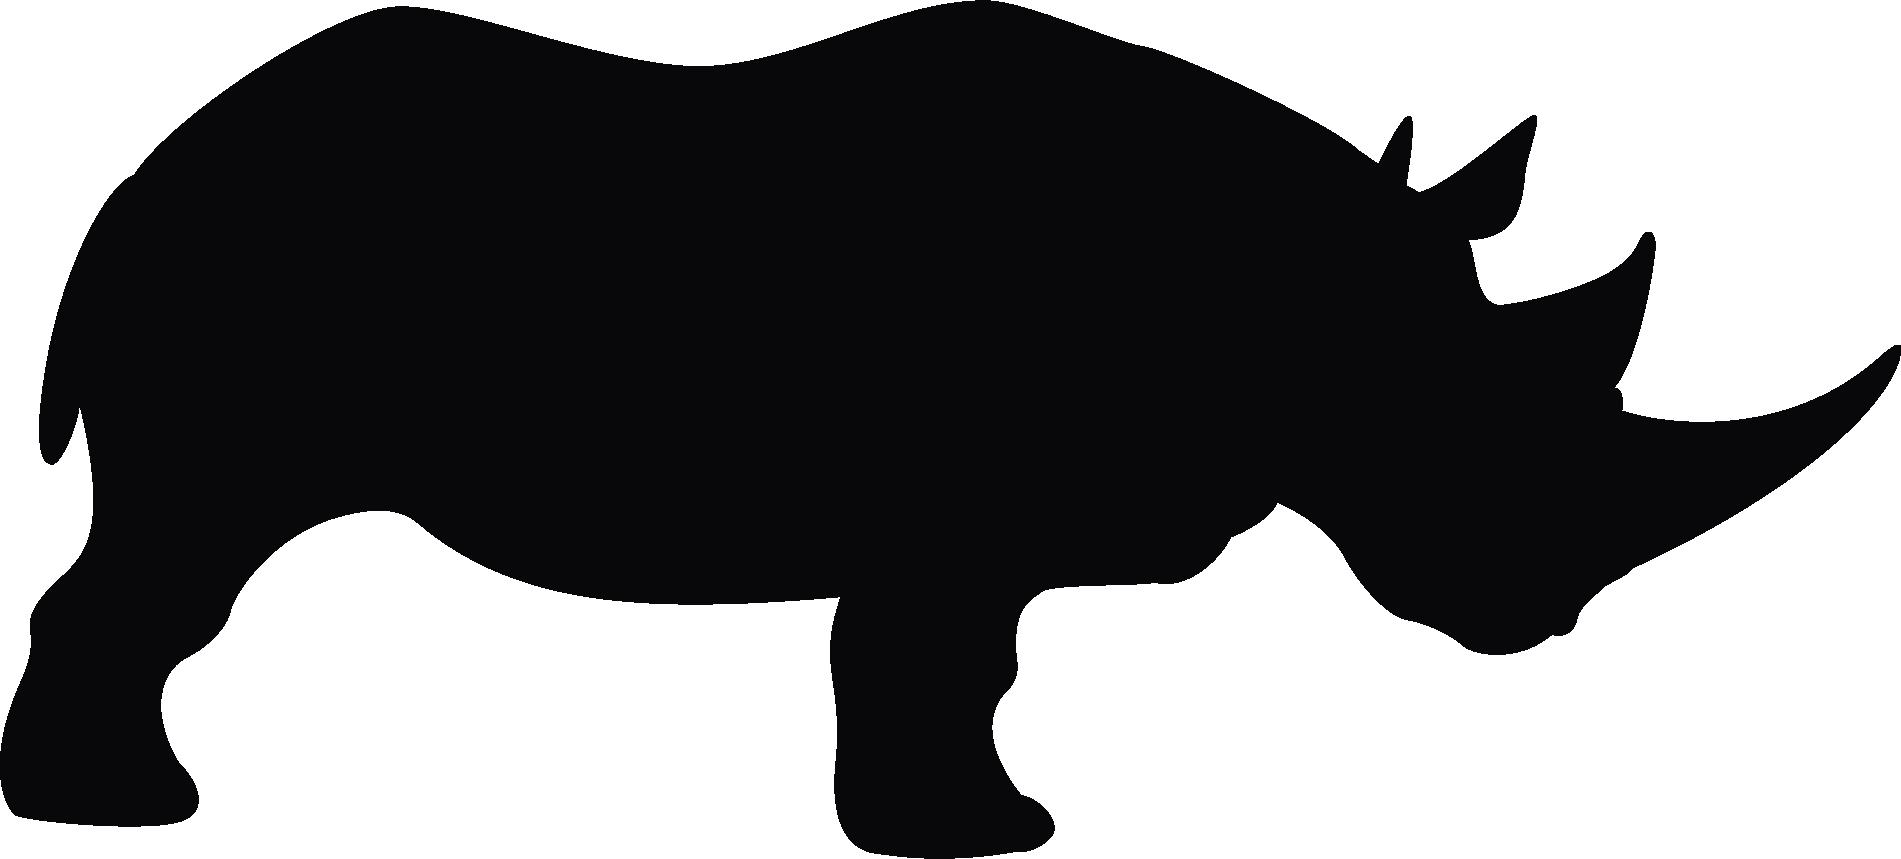 Rhinoceros Rudolph Poaching Clip art.